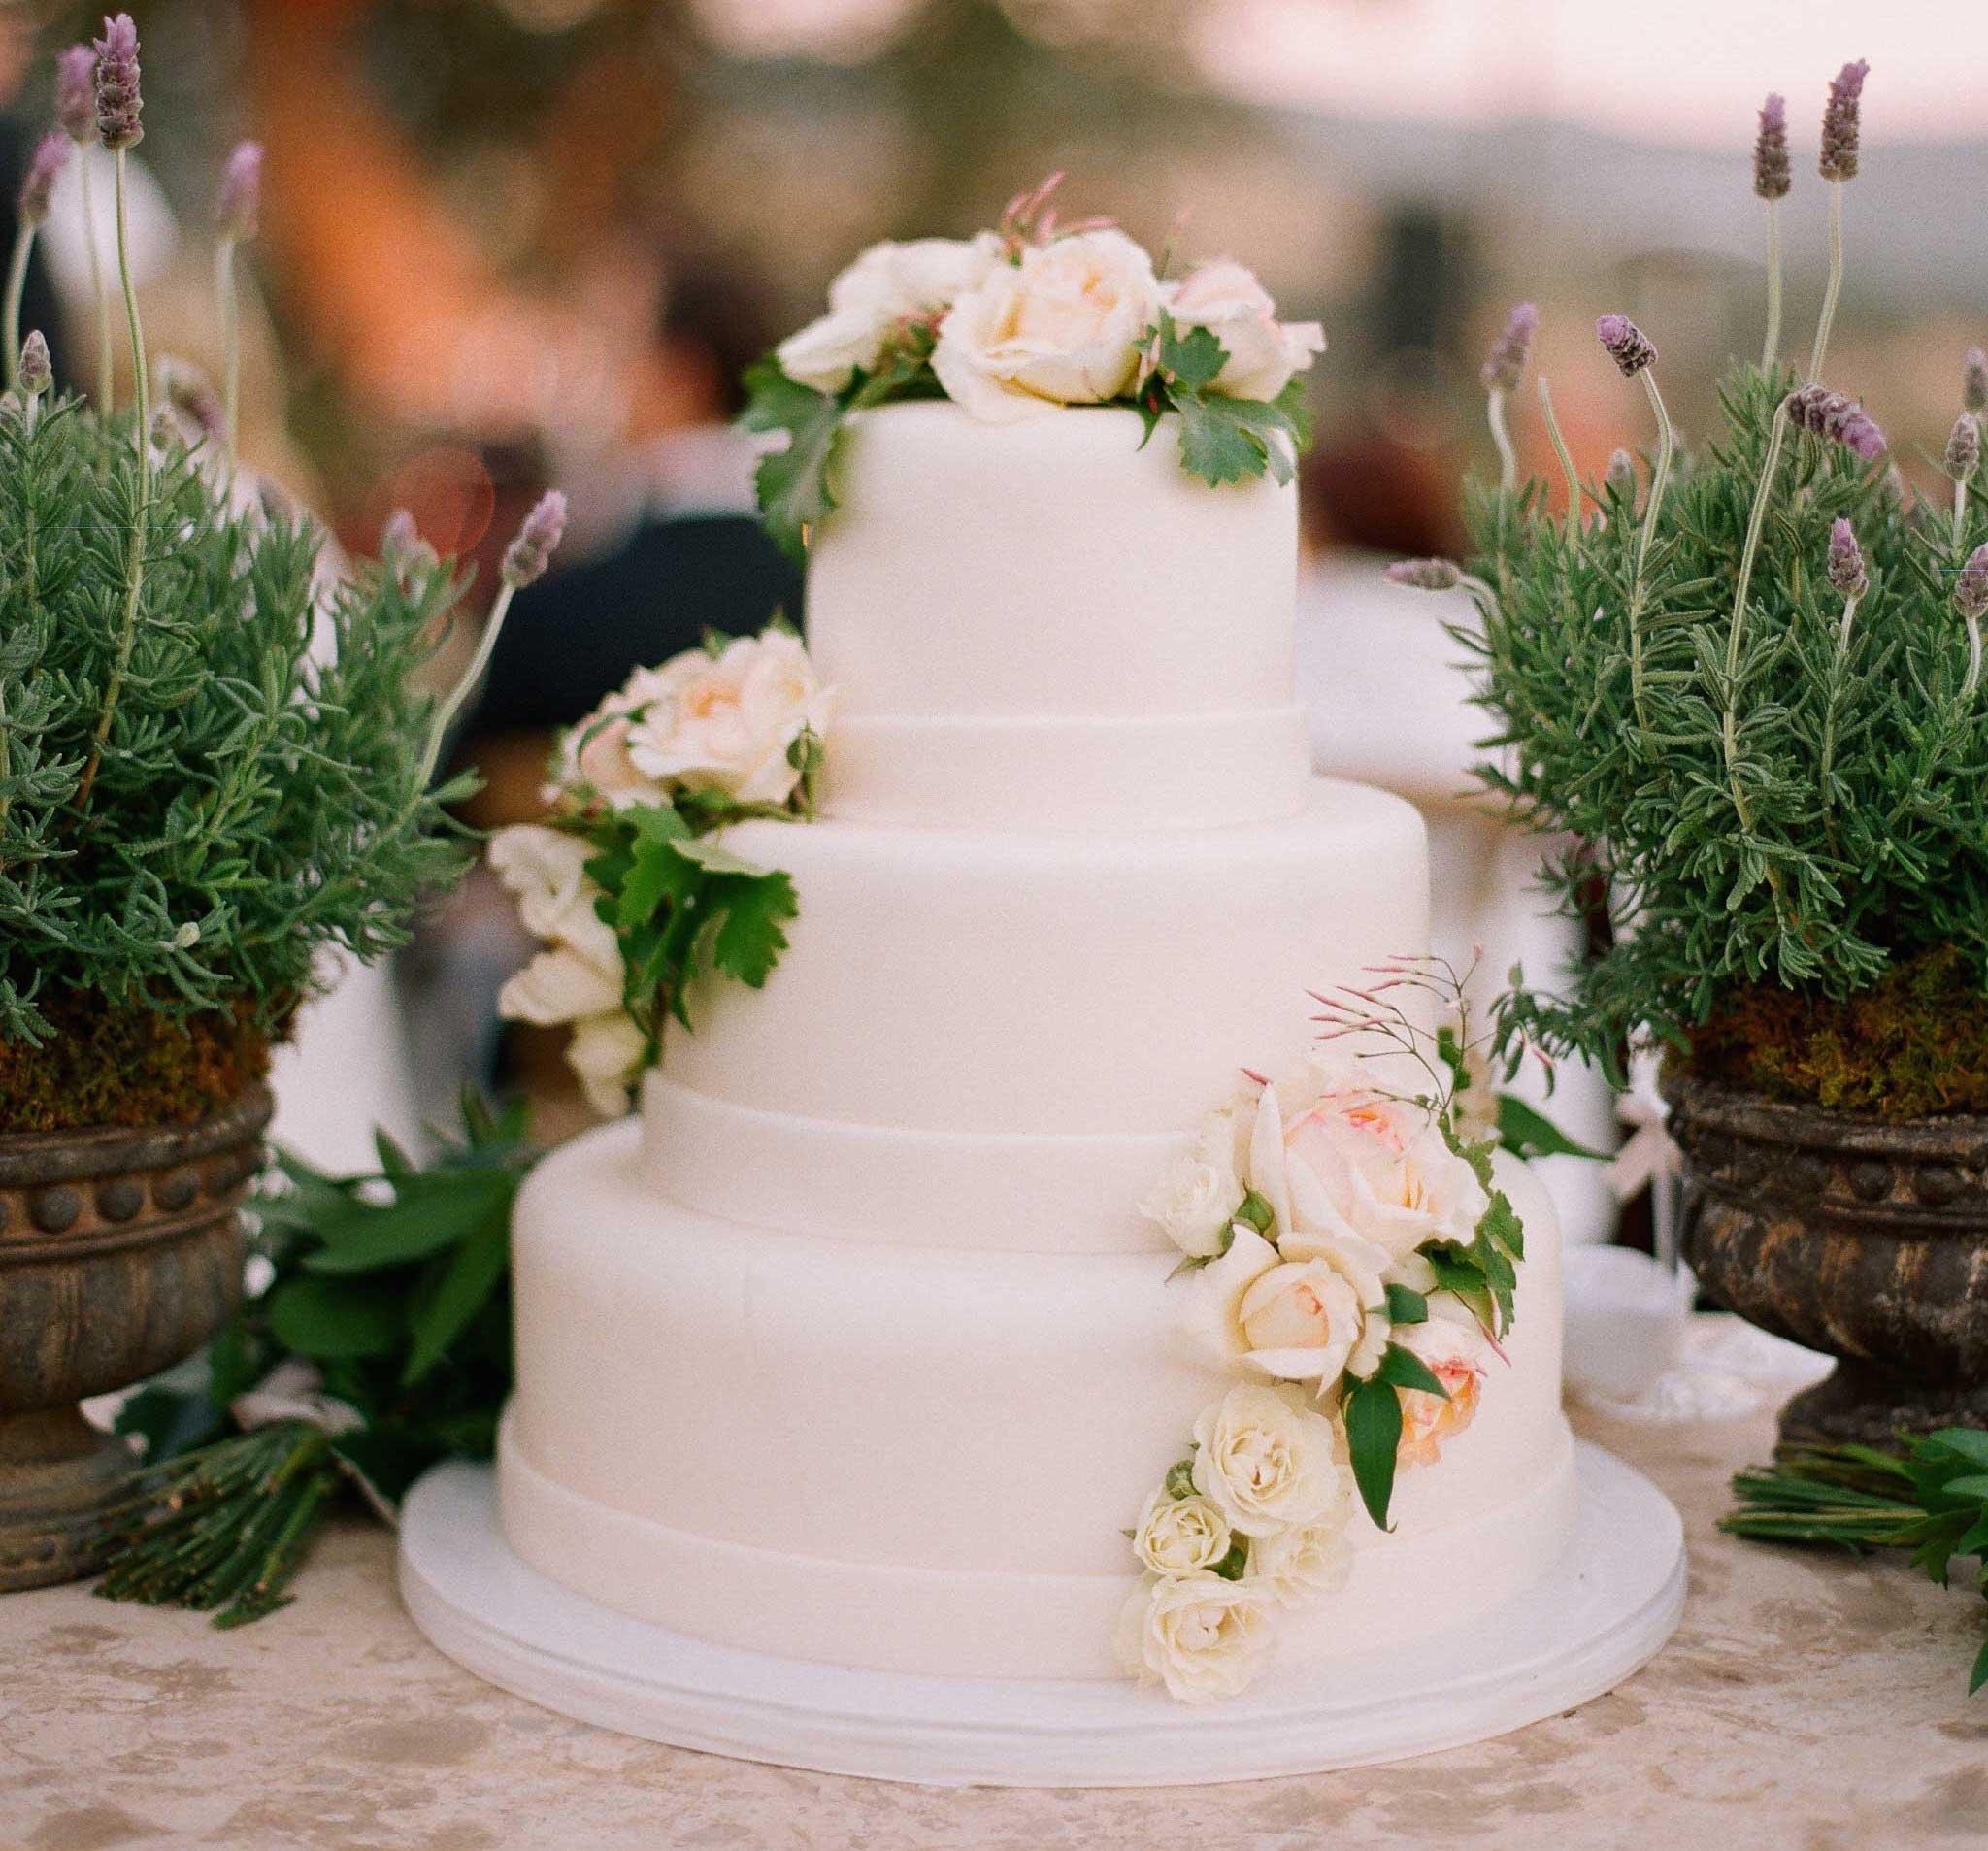 Small Wedding Cakes Everyone Will Love Inside Weddings,Minimalist Negative Space Logo Design